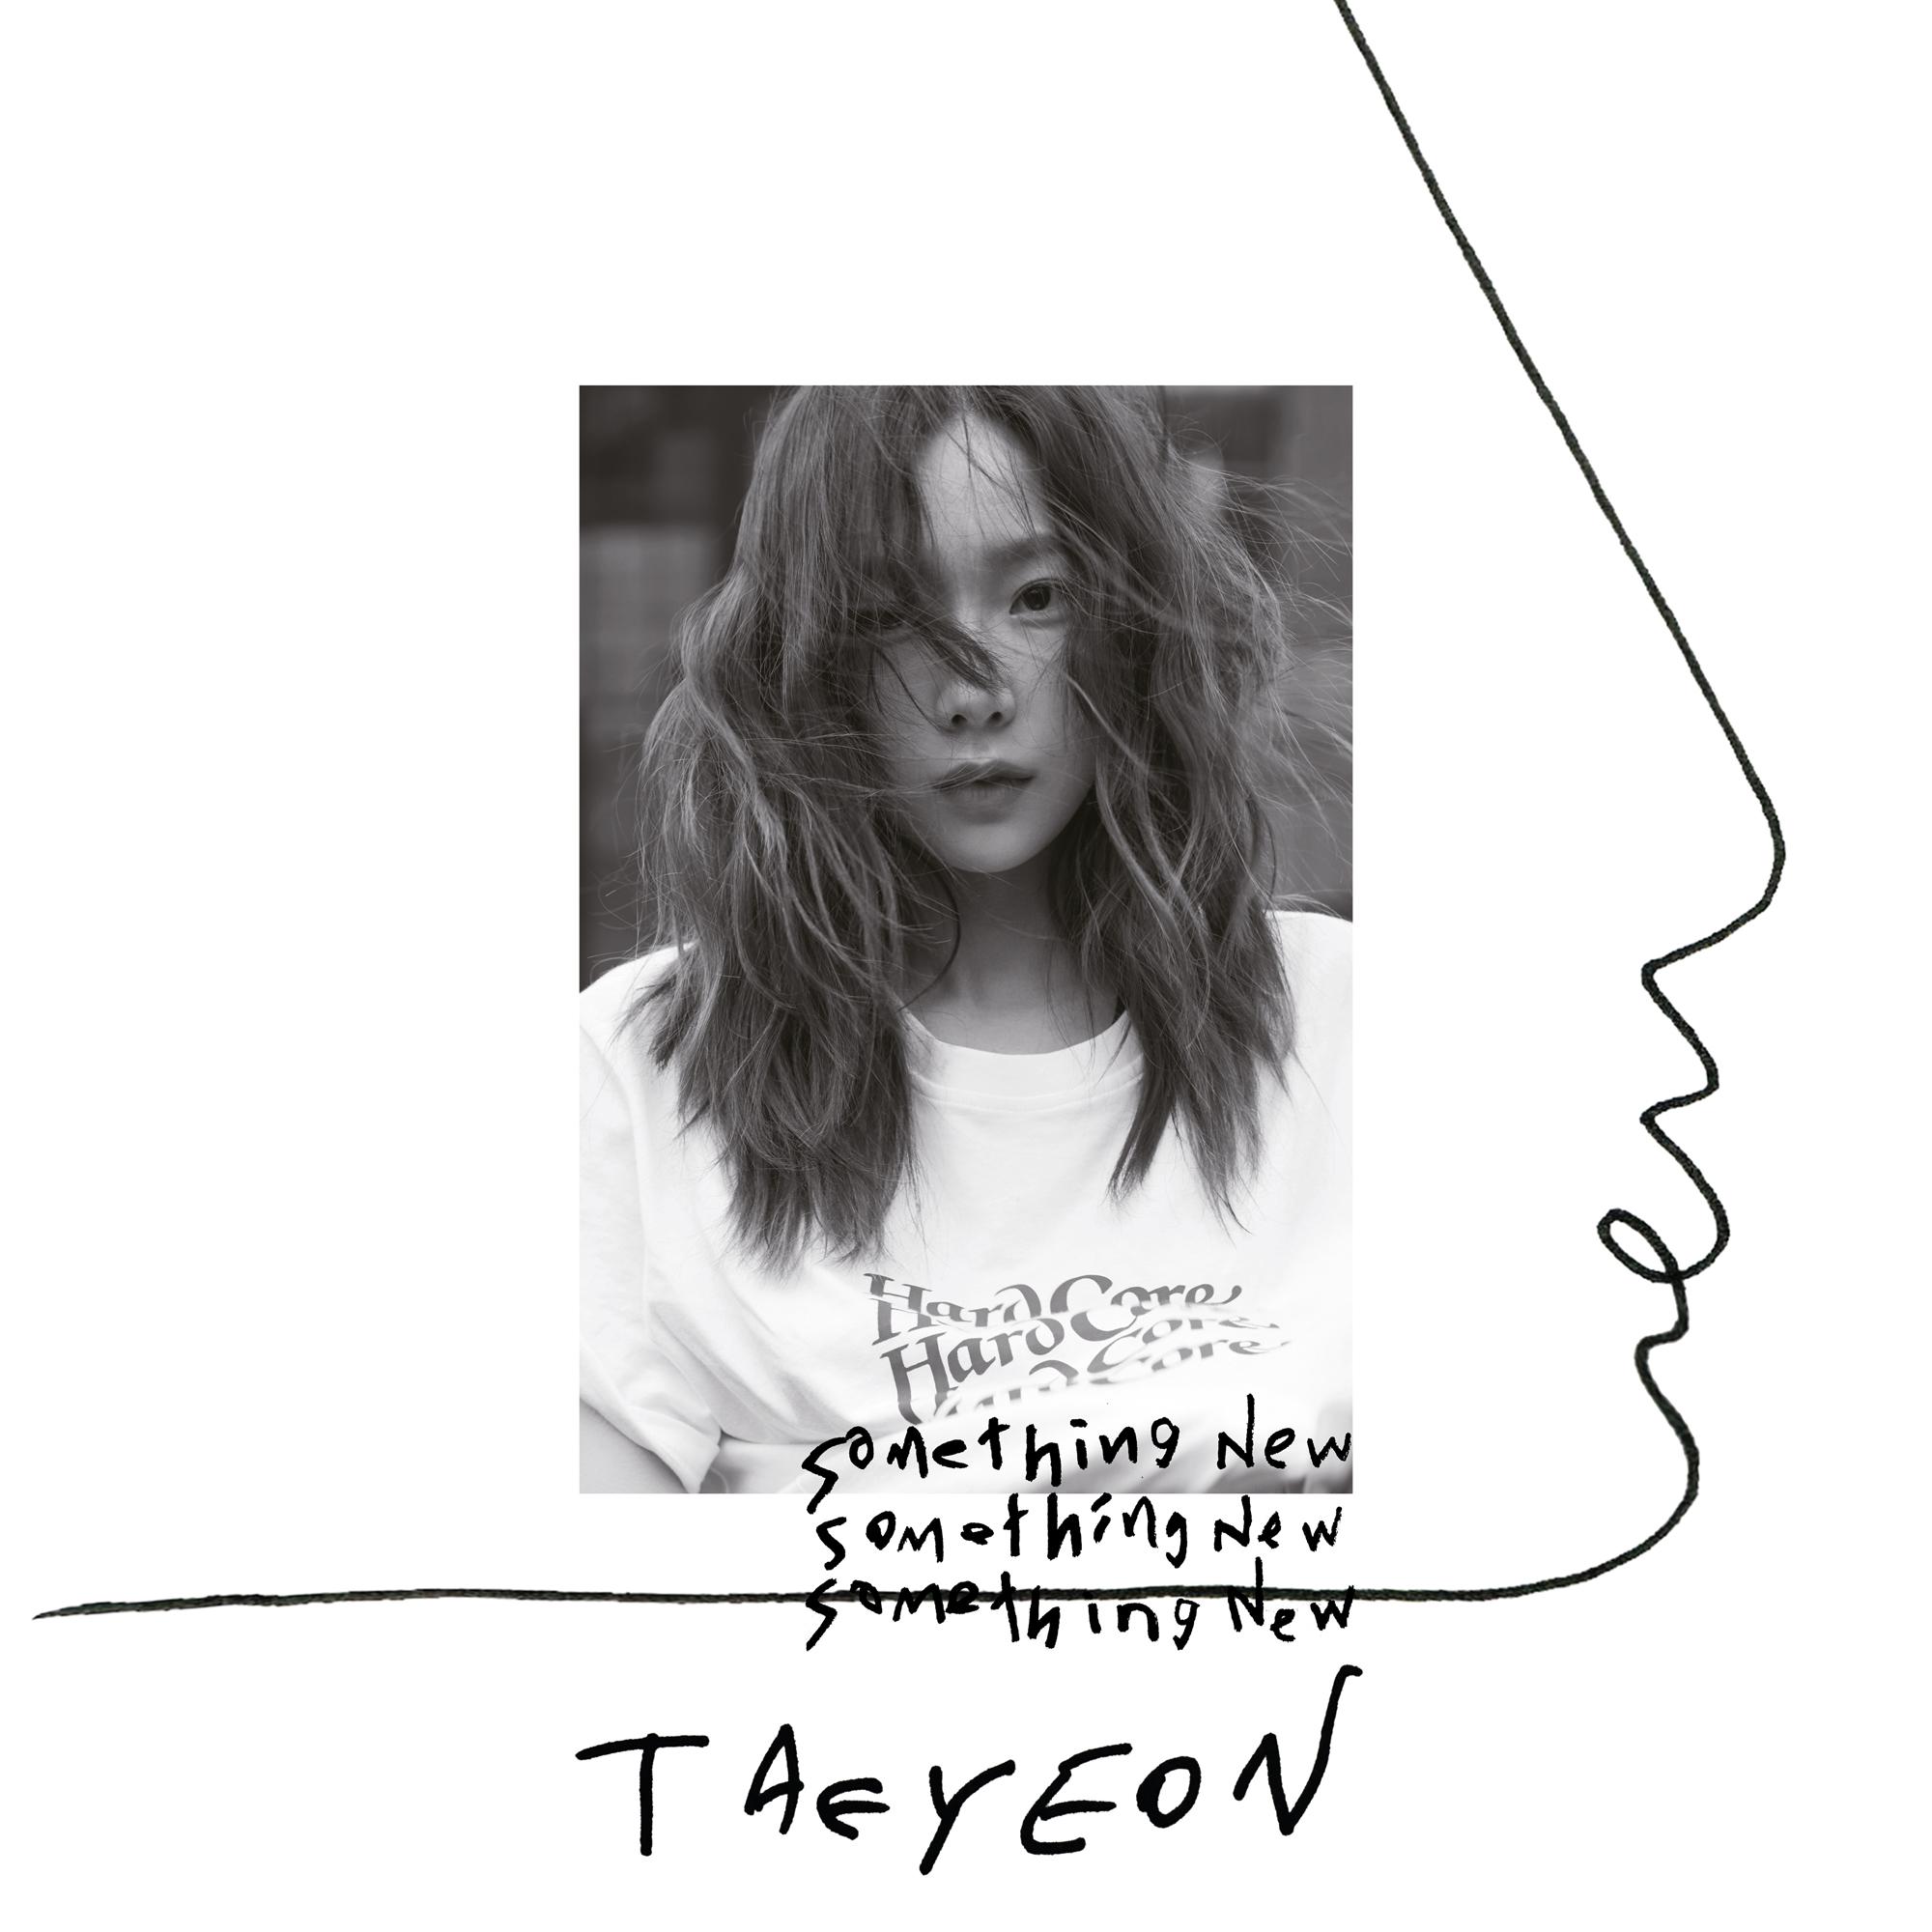 20180624.1628.06 TaeYeon - Something New cover.jpg